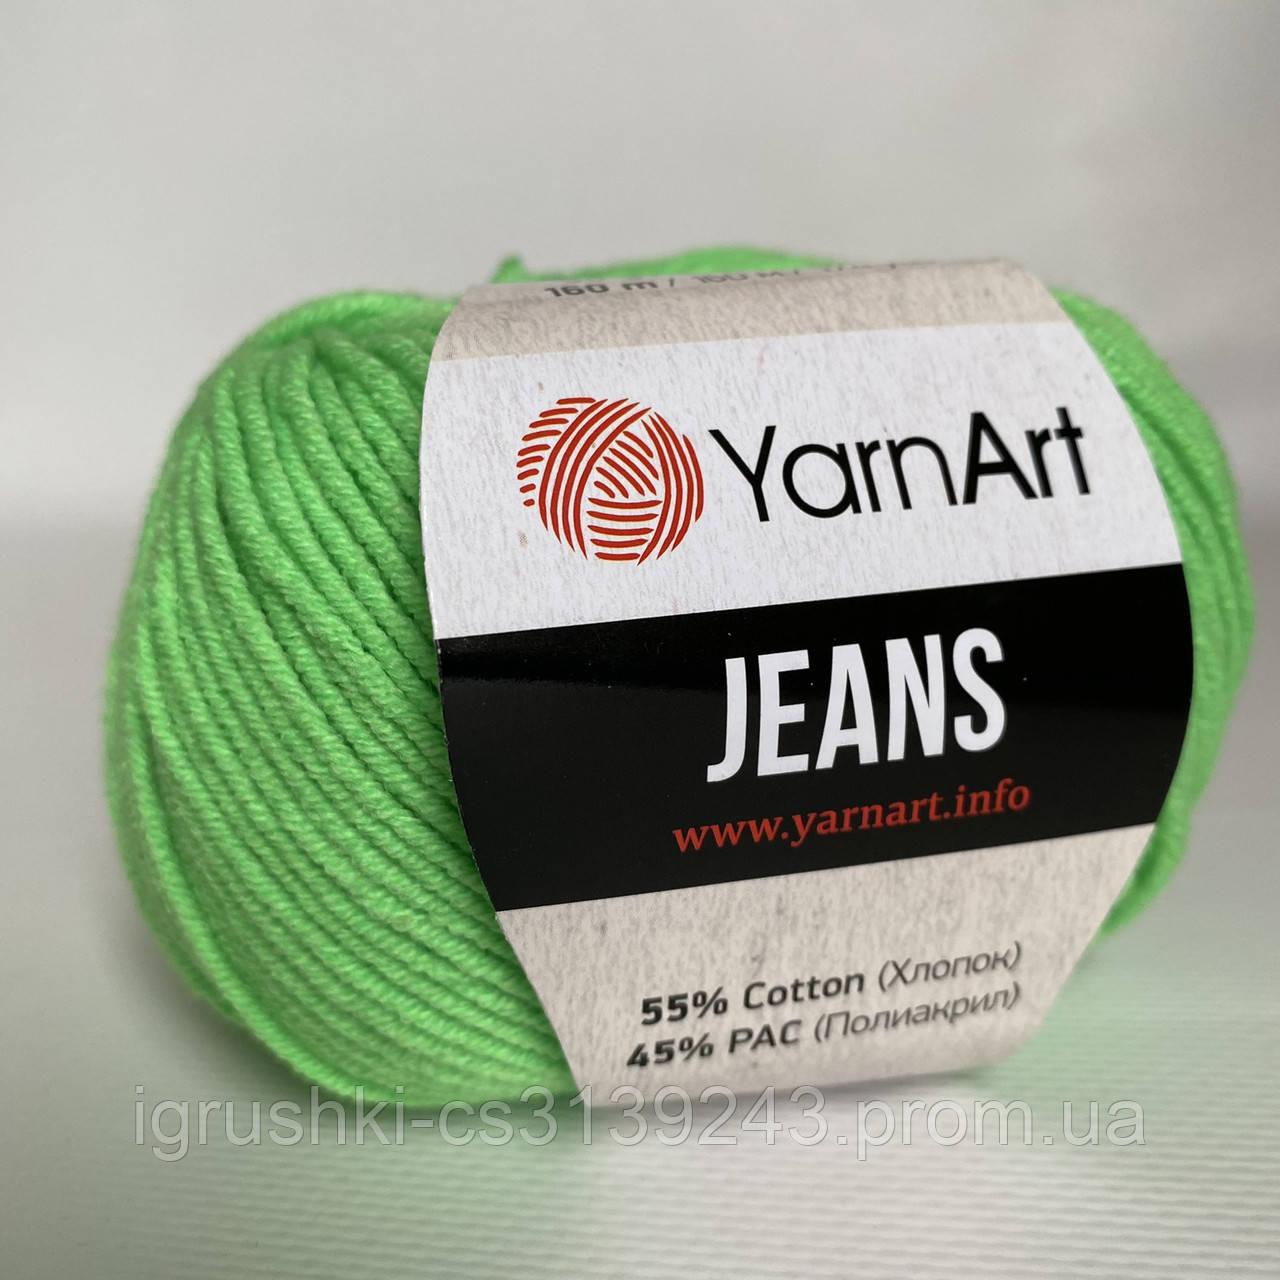 YarnArt Jeans (ярнарт джинс) 60 Ментол